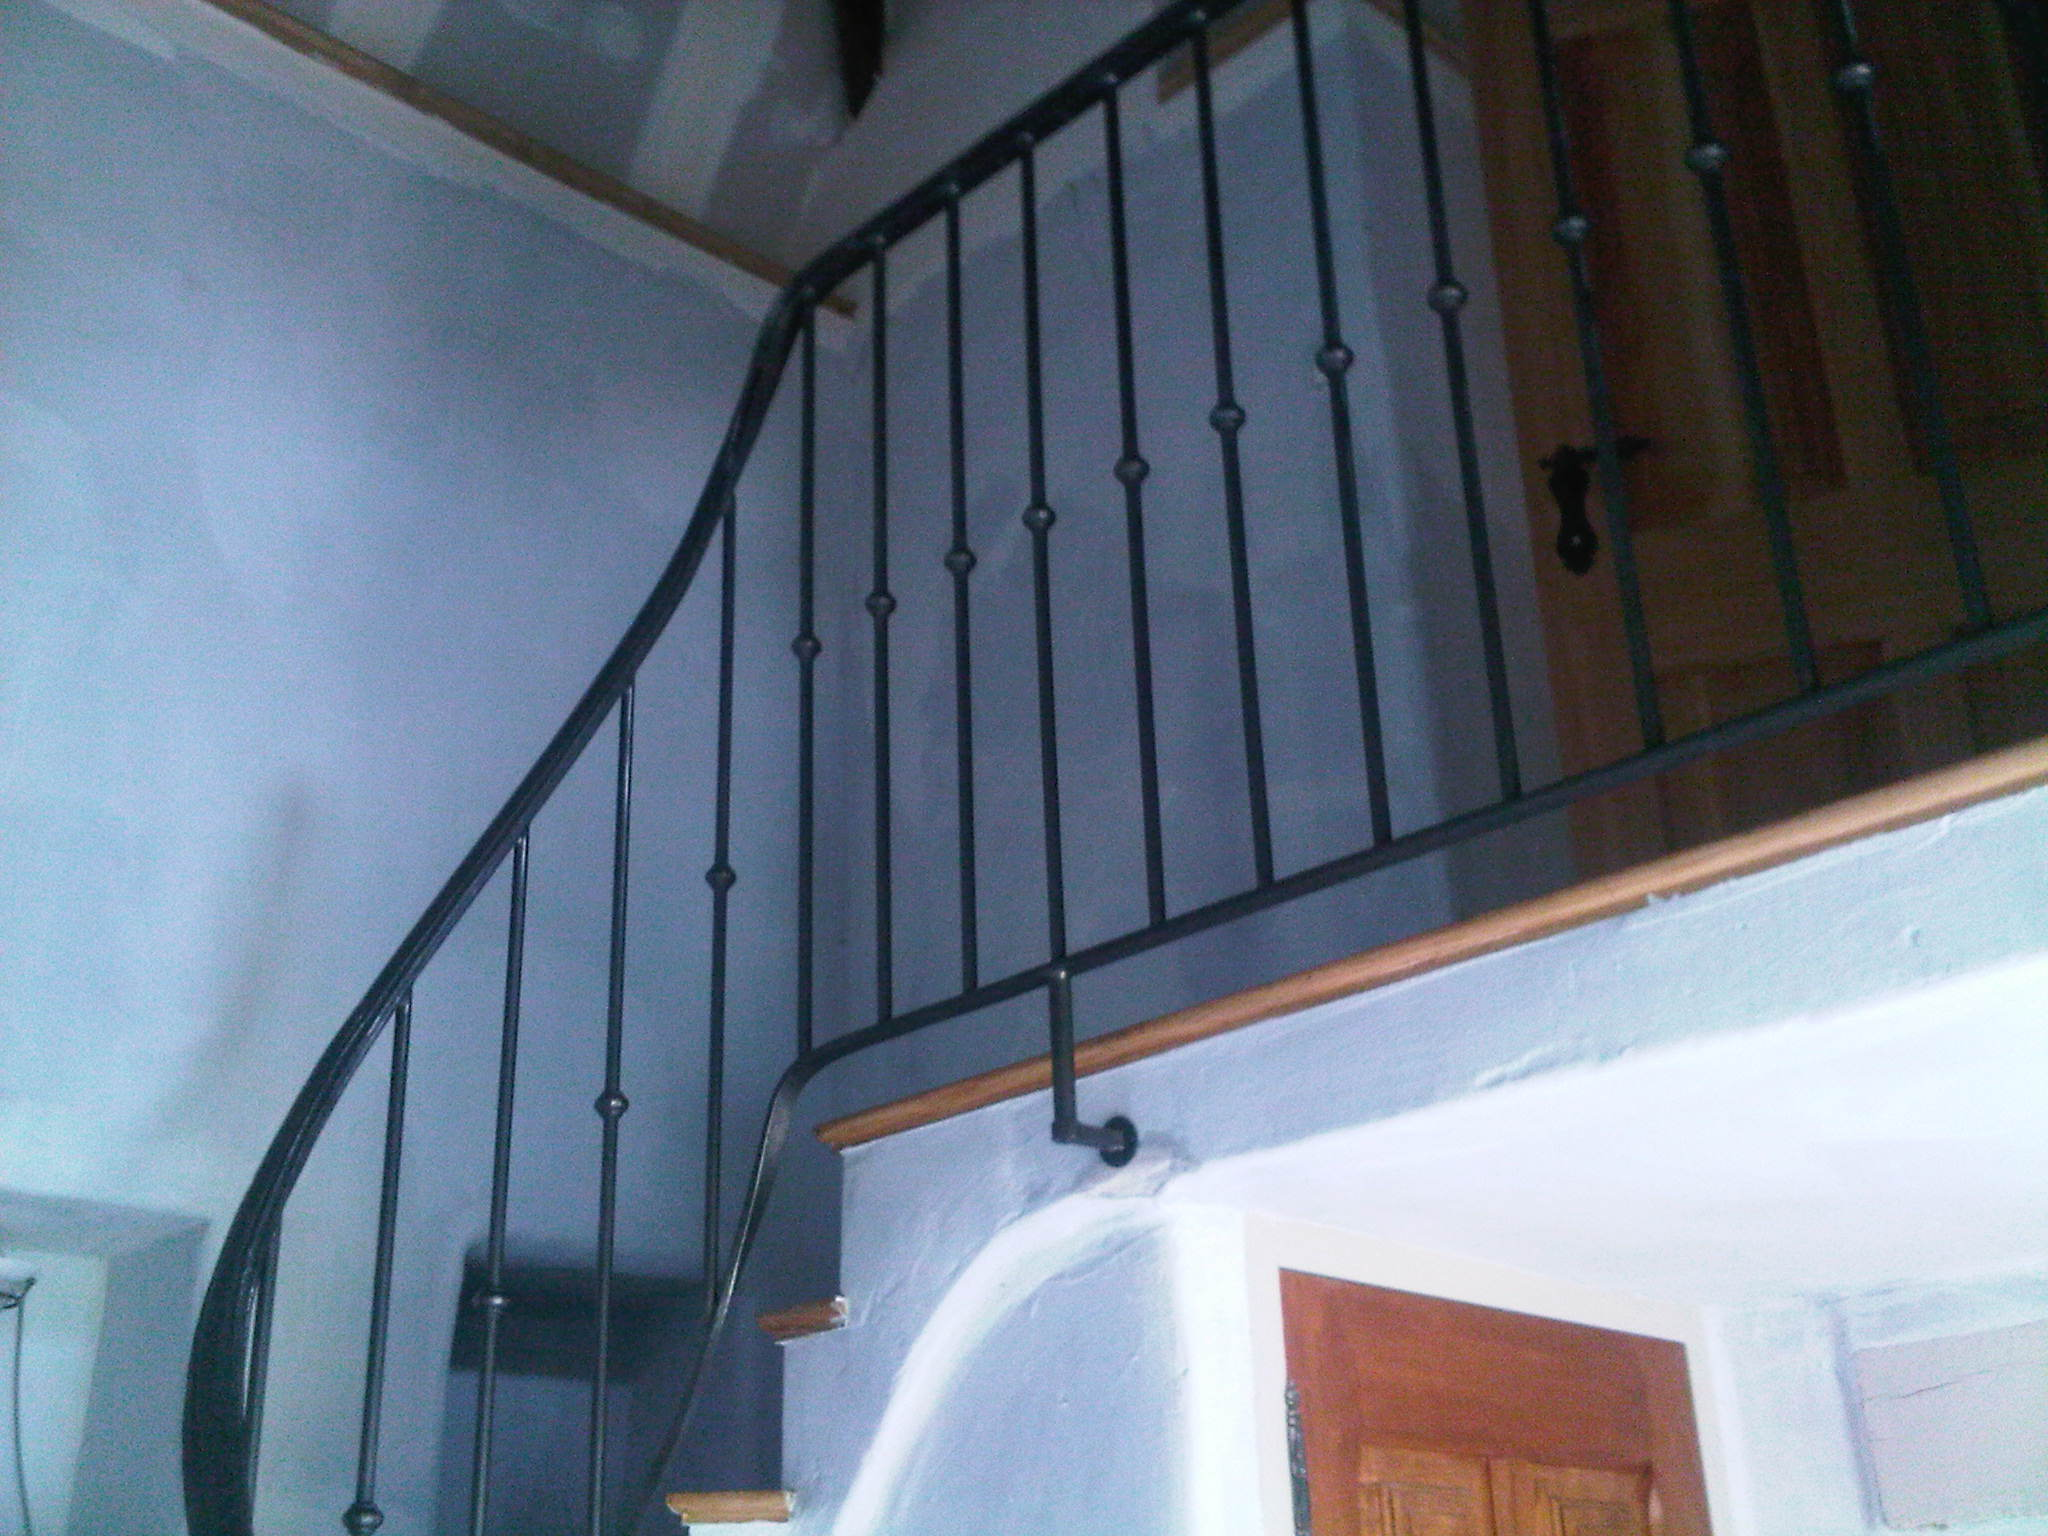 rampe débillardée, sur voûte sarrazine, finition métal brut ciré